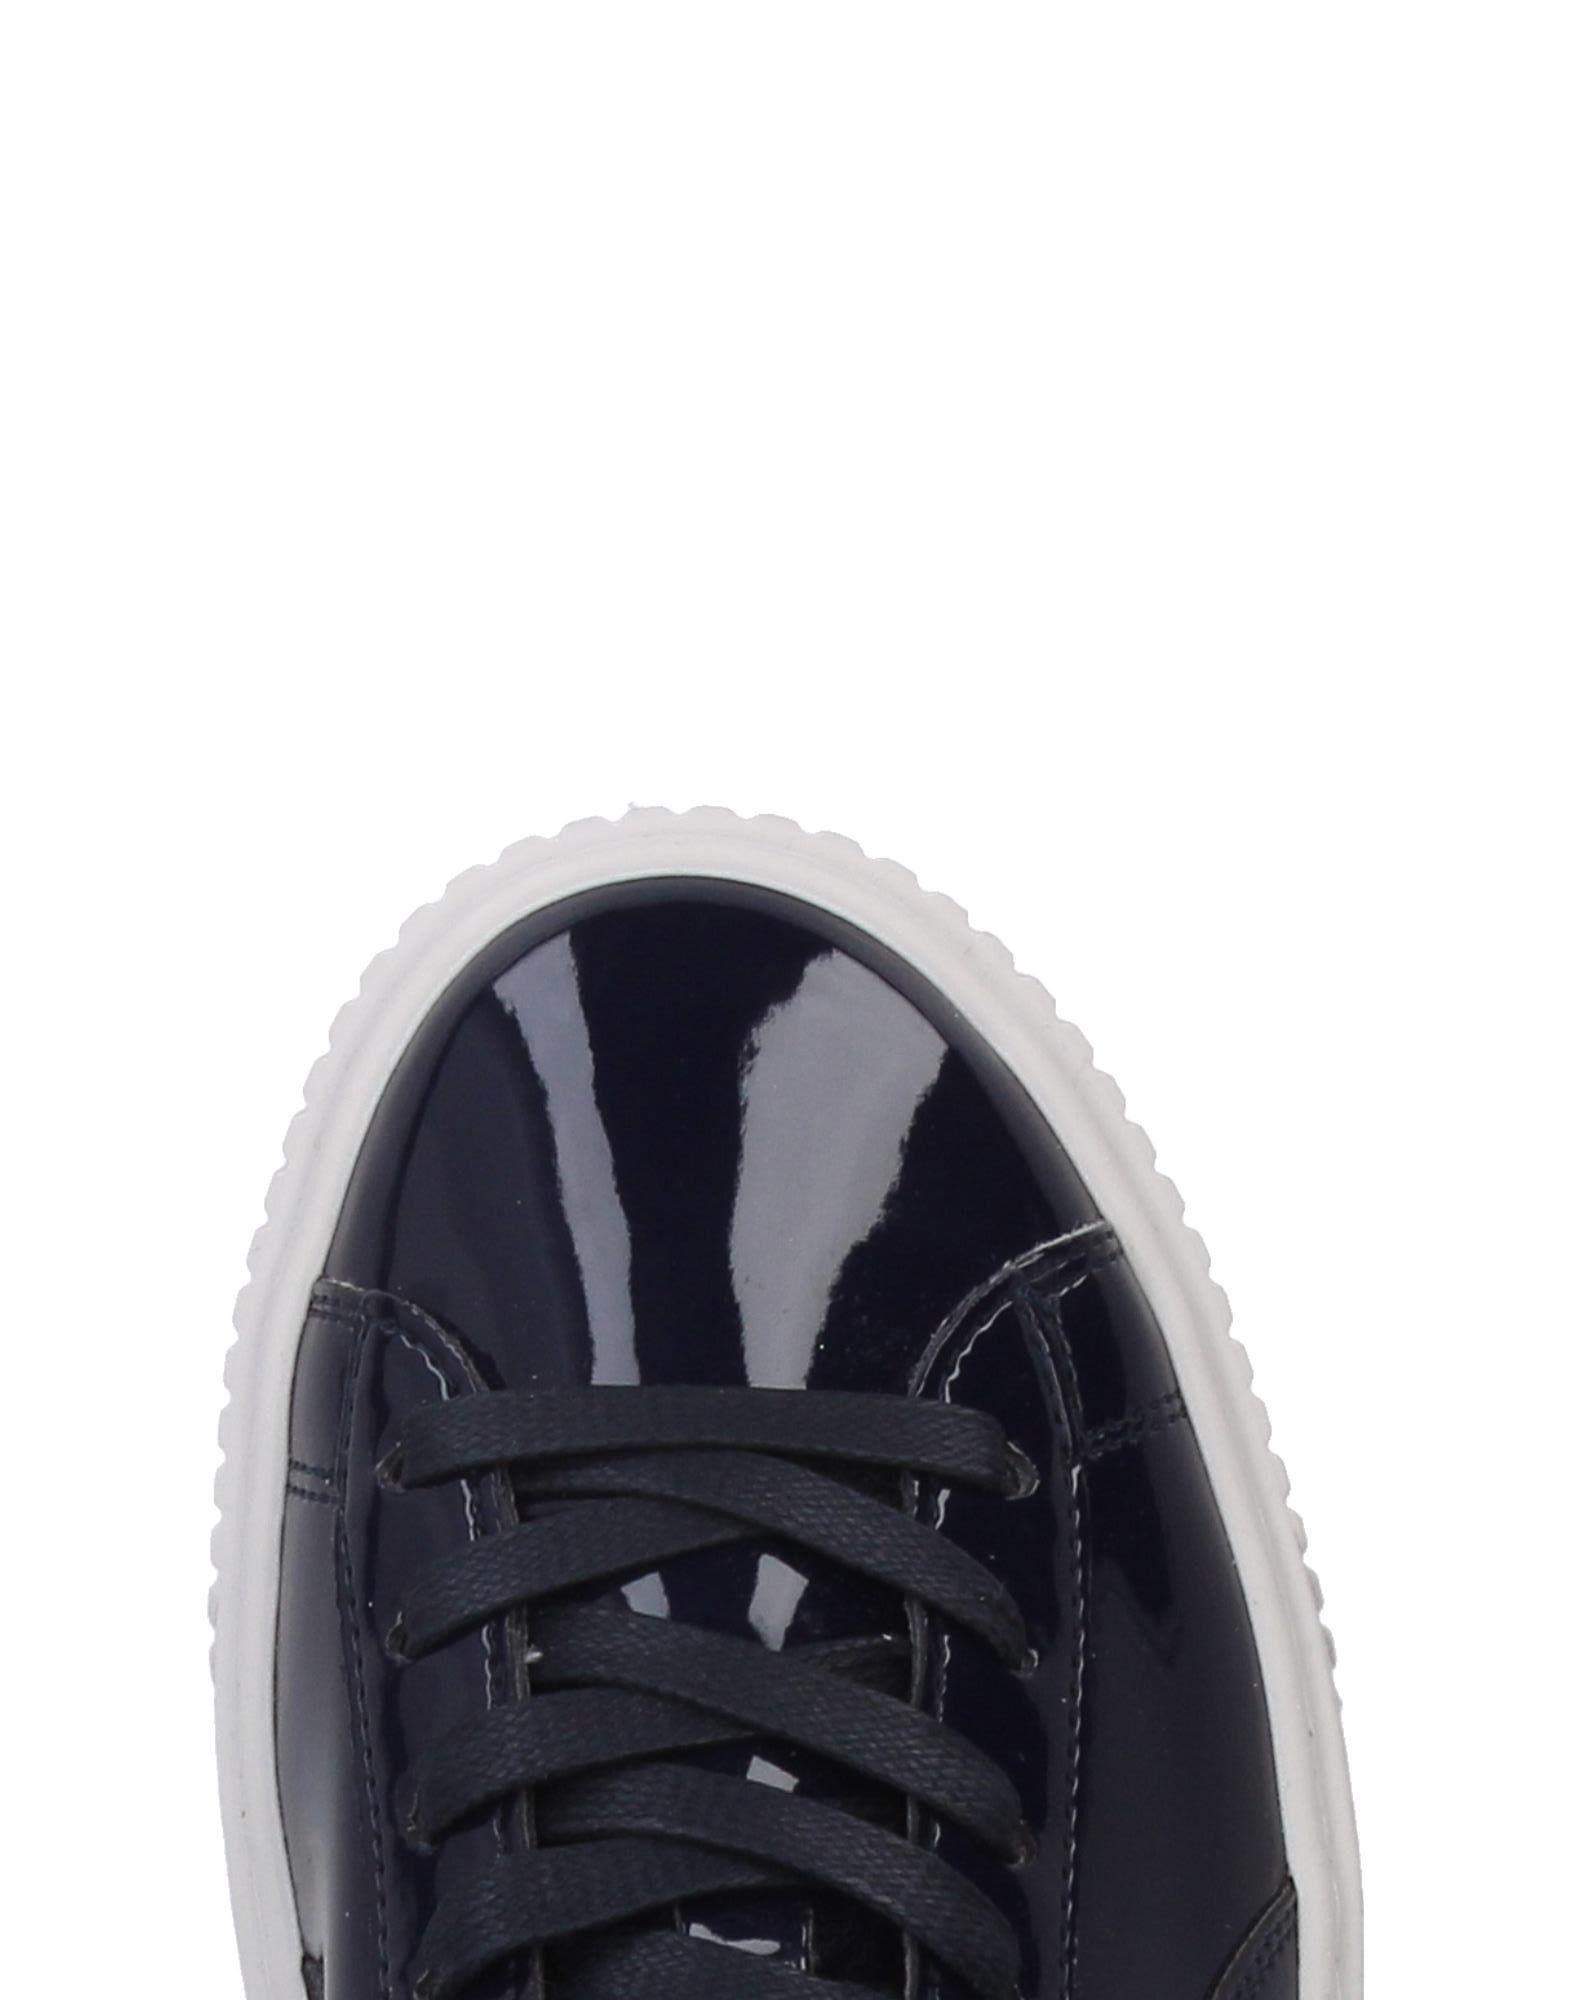 Puma Sneakers Damen Damen Sneakers Gutes Preis-Leistungs-Verhältnis, es lohnt sich 2e5157